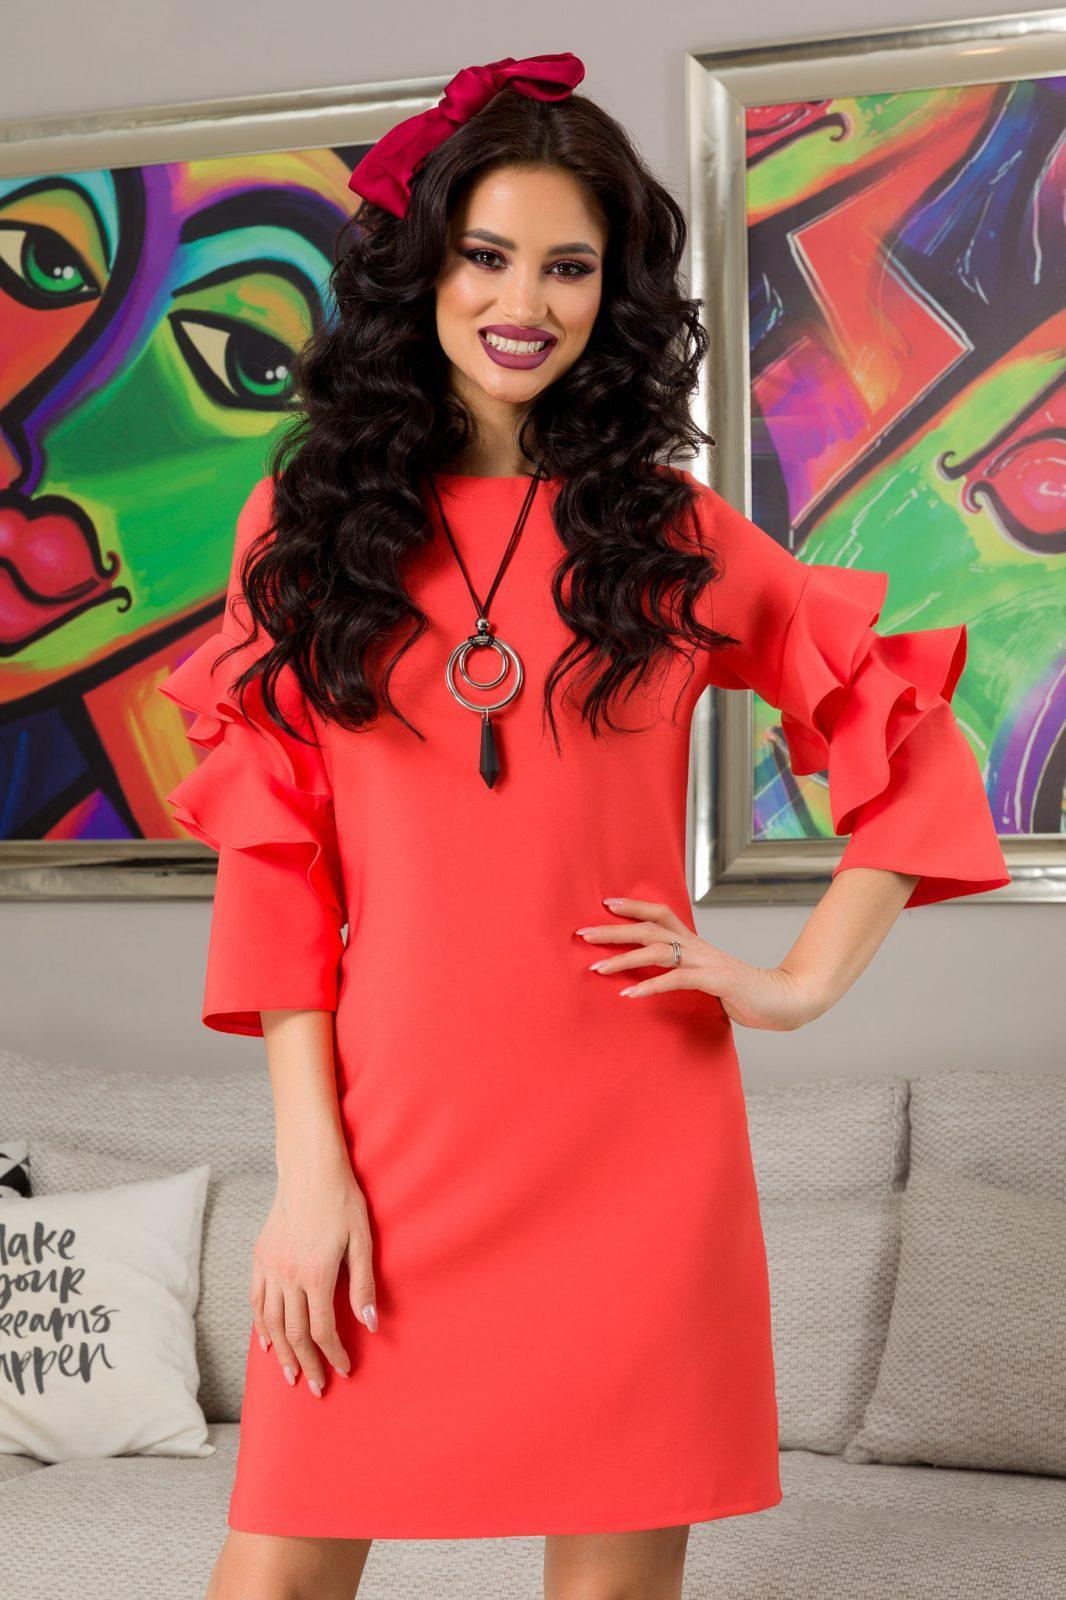 Hanna Coral Dress